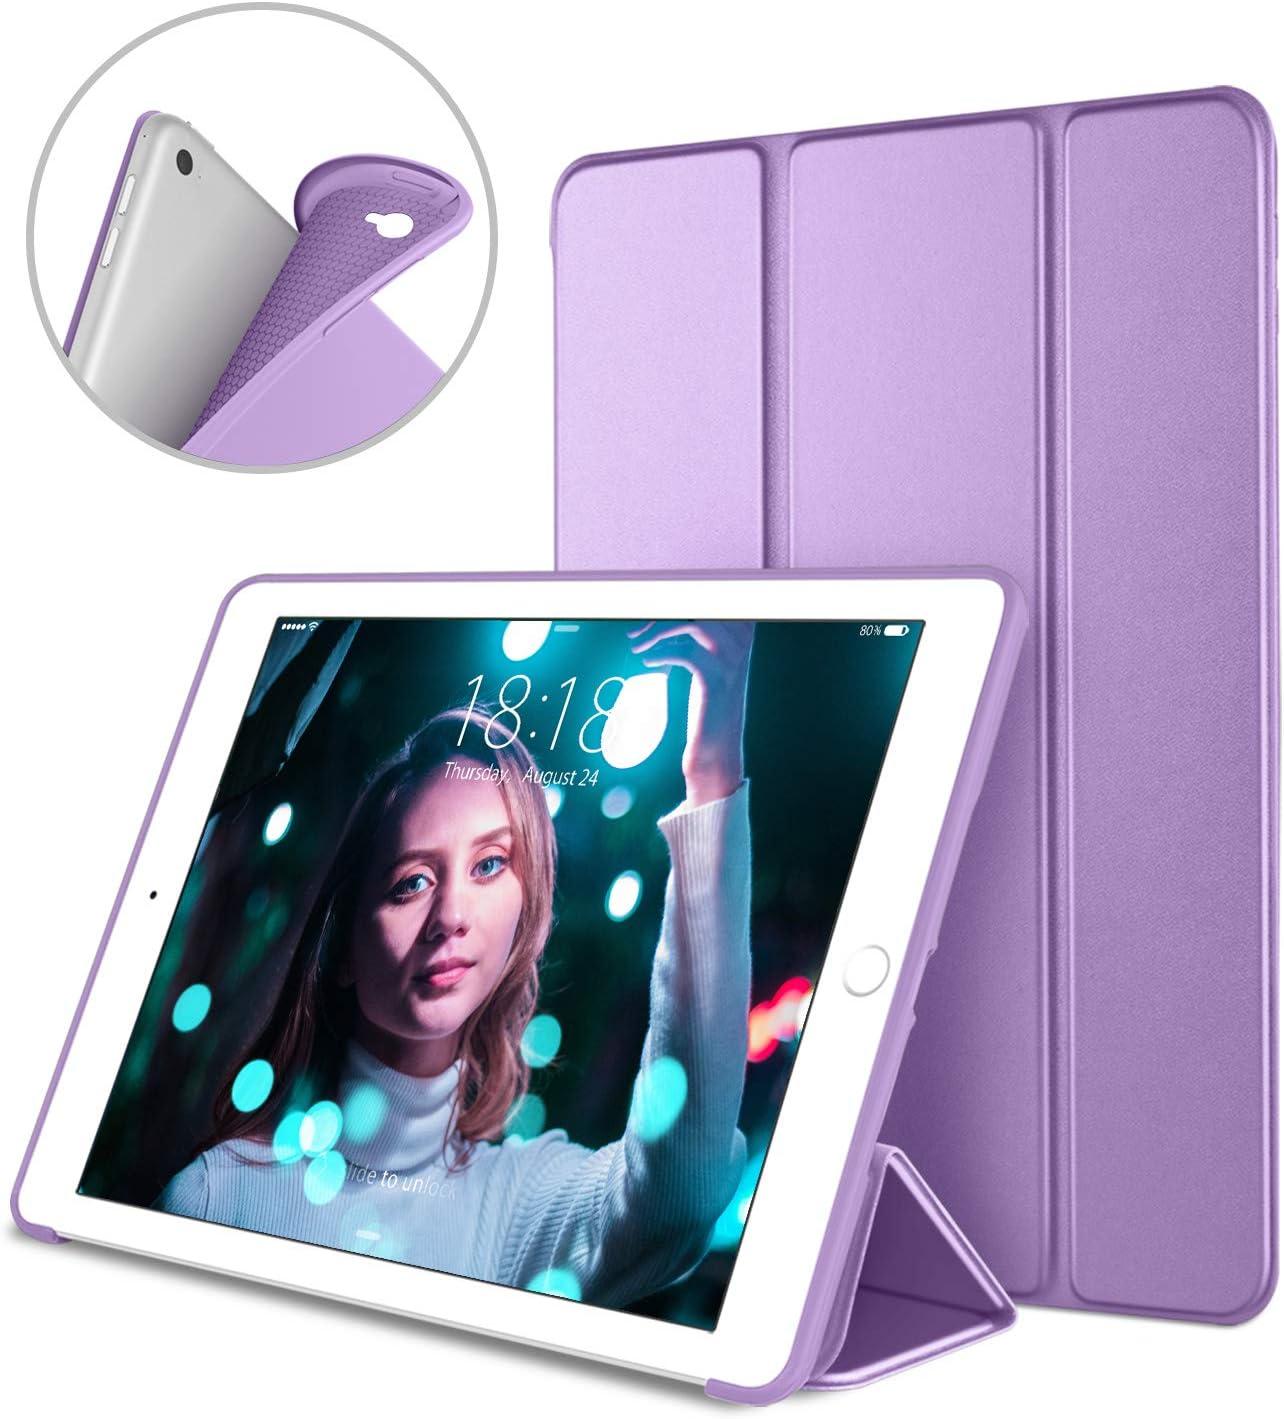 Funda DTTO para Apple iPad Air 2 9.7 2014-63ZW